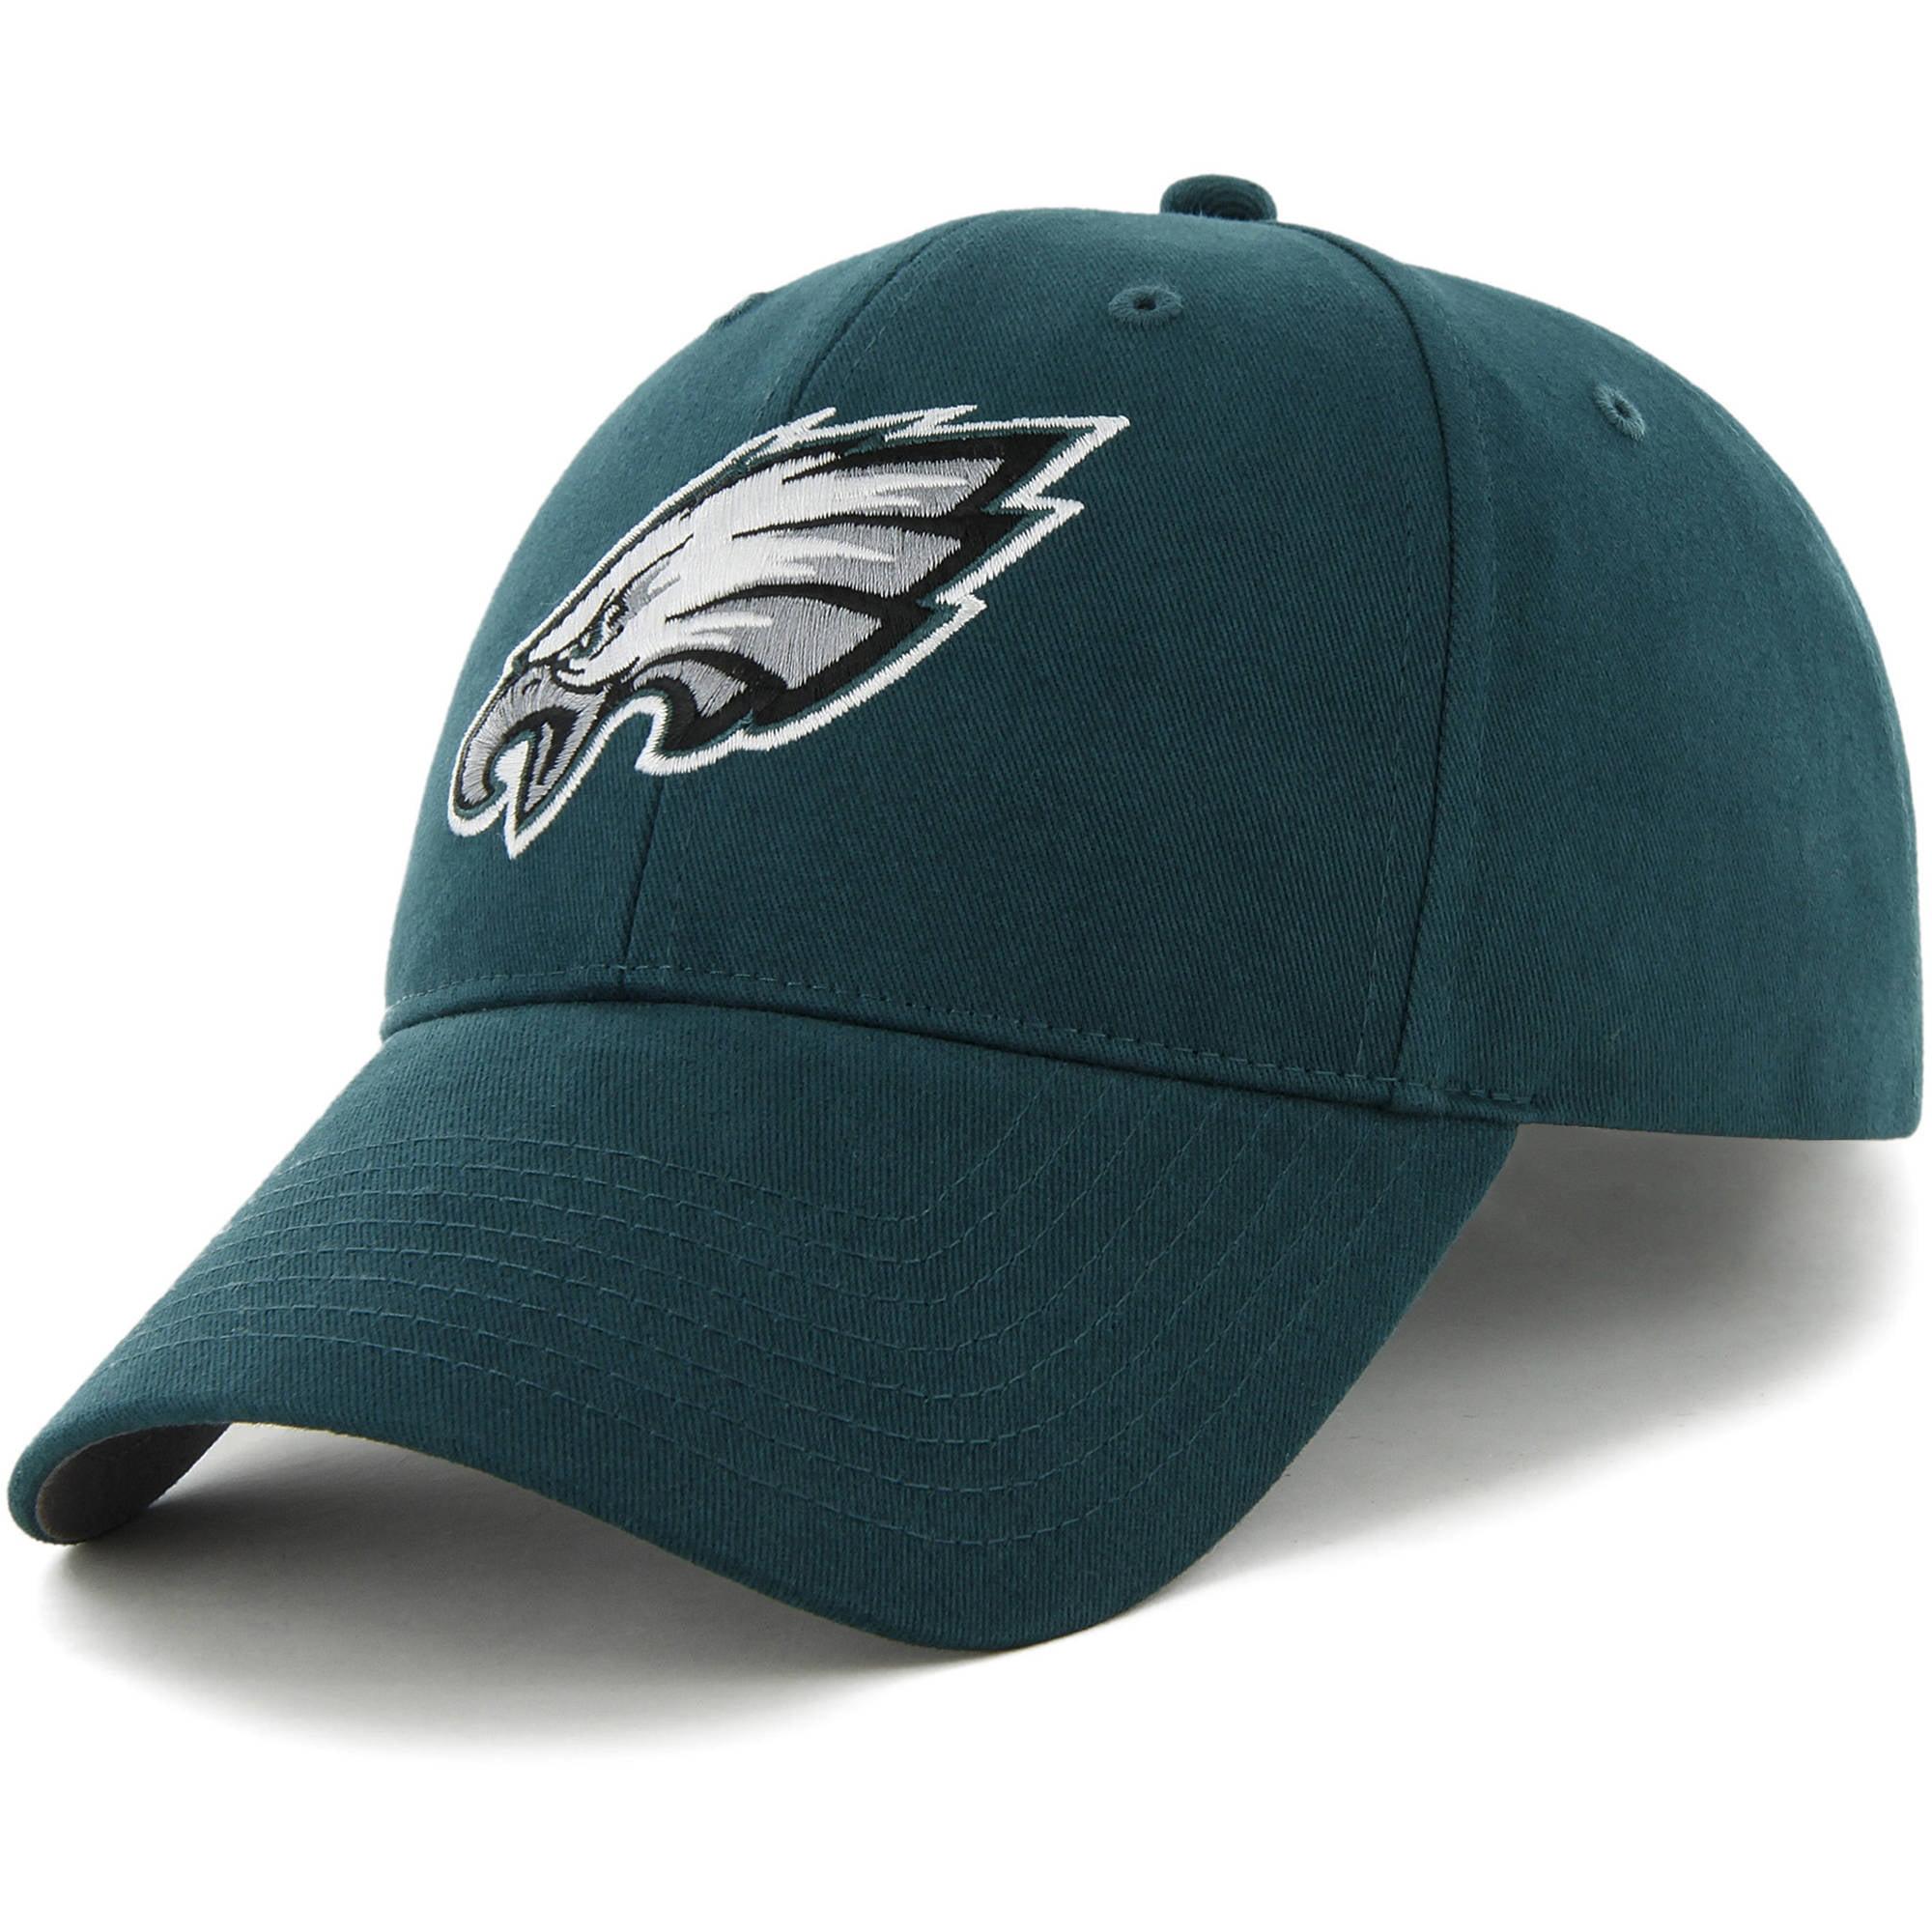 NFL Fan FavoriteBasic Cap, Philadelphia Eagles